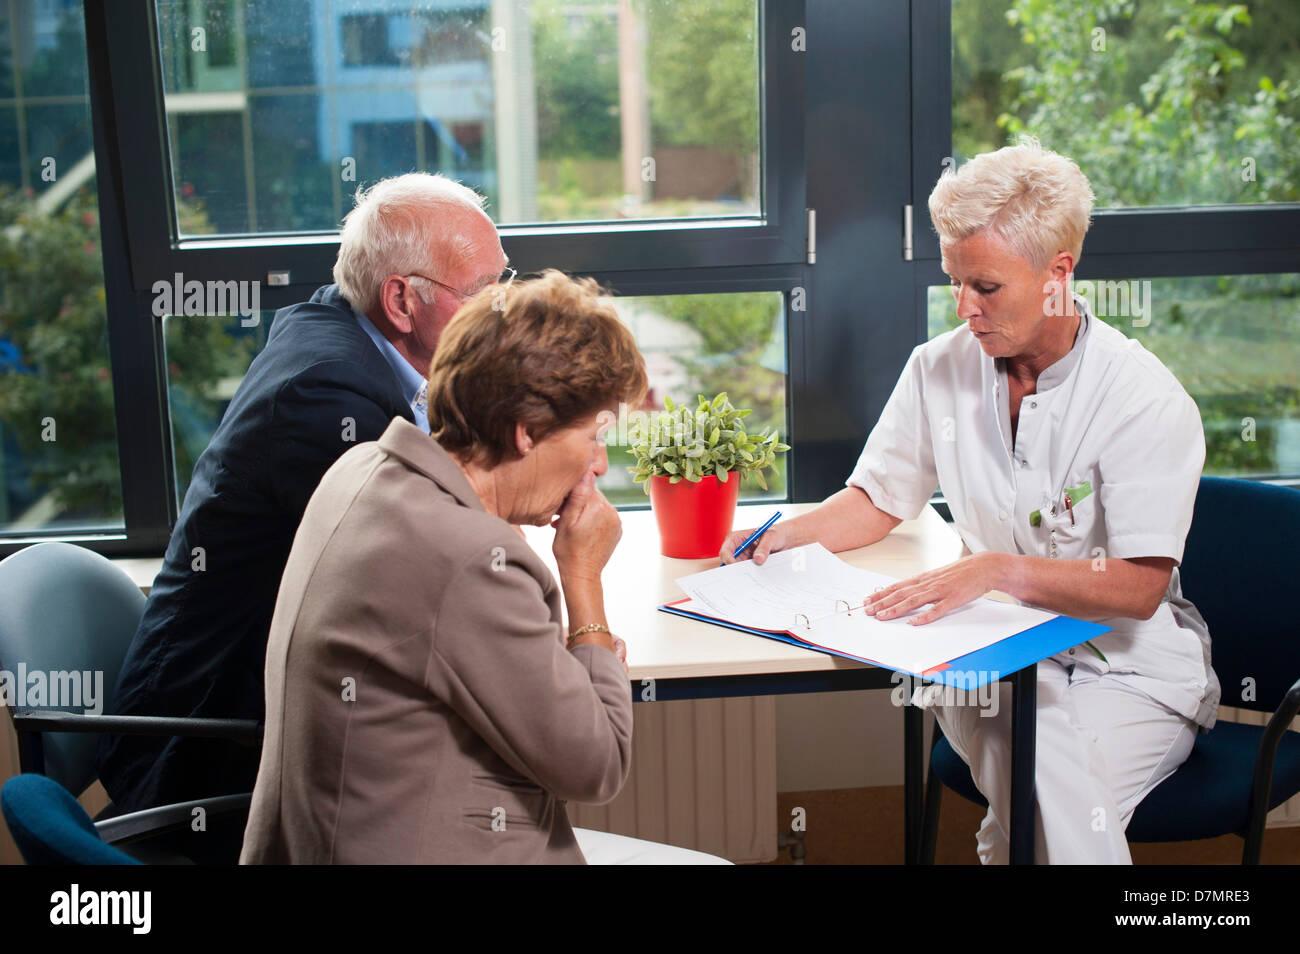 Hospital consultation - Stock Image